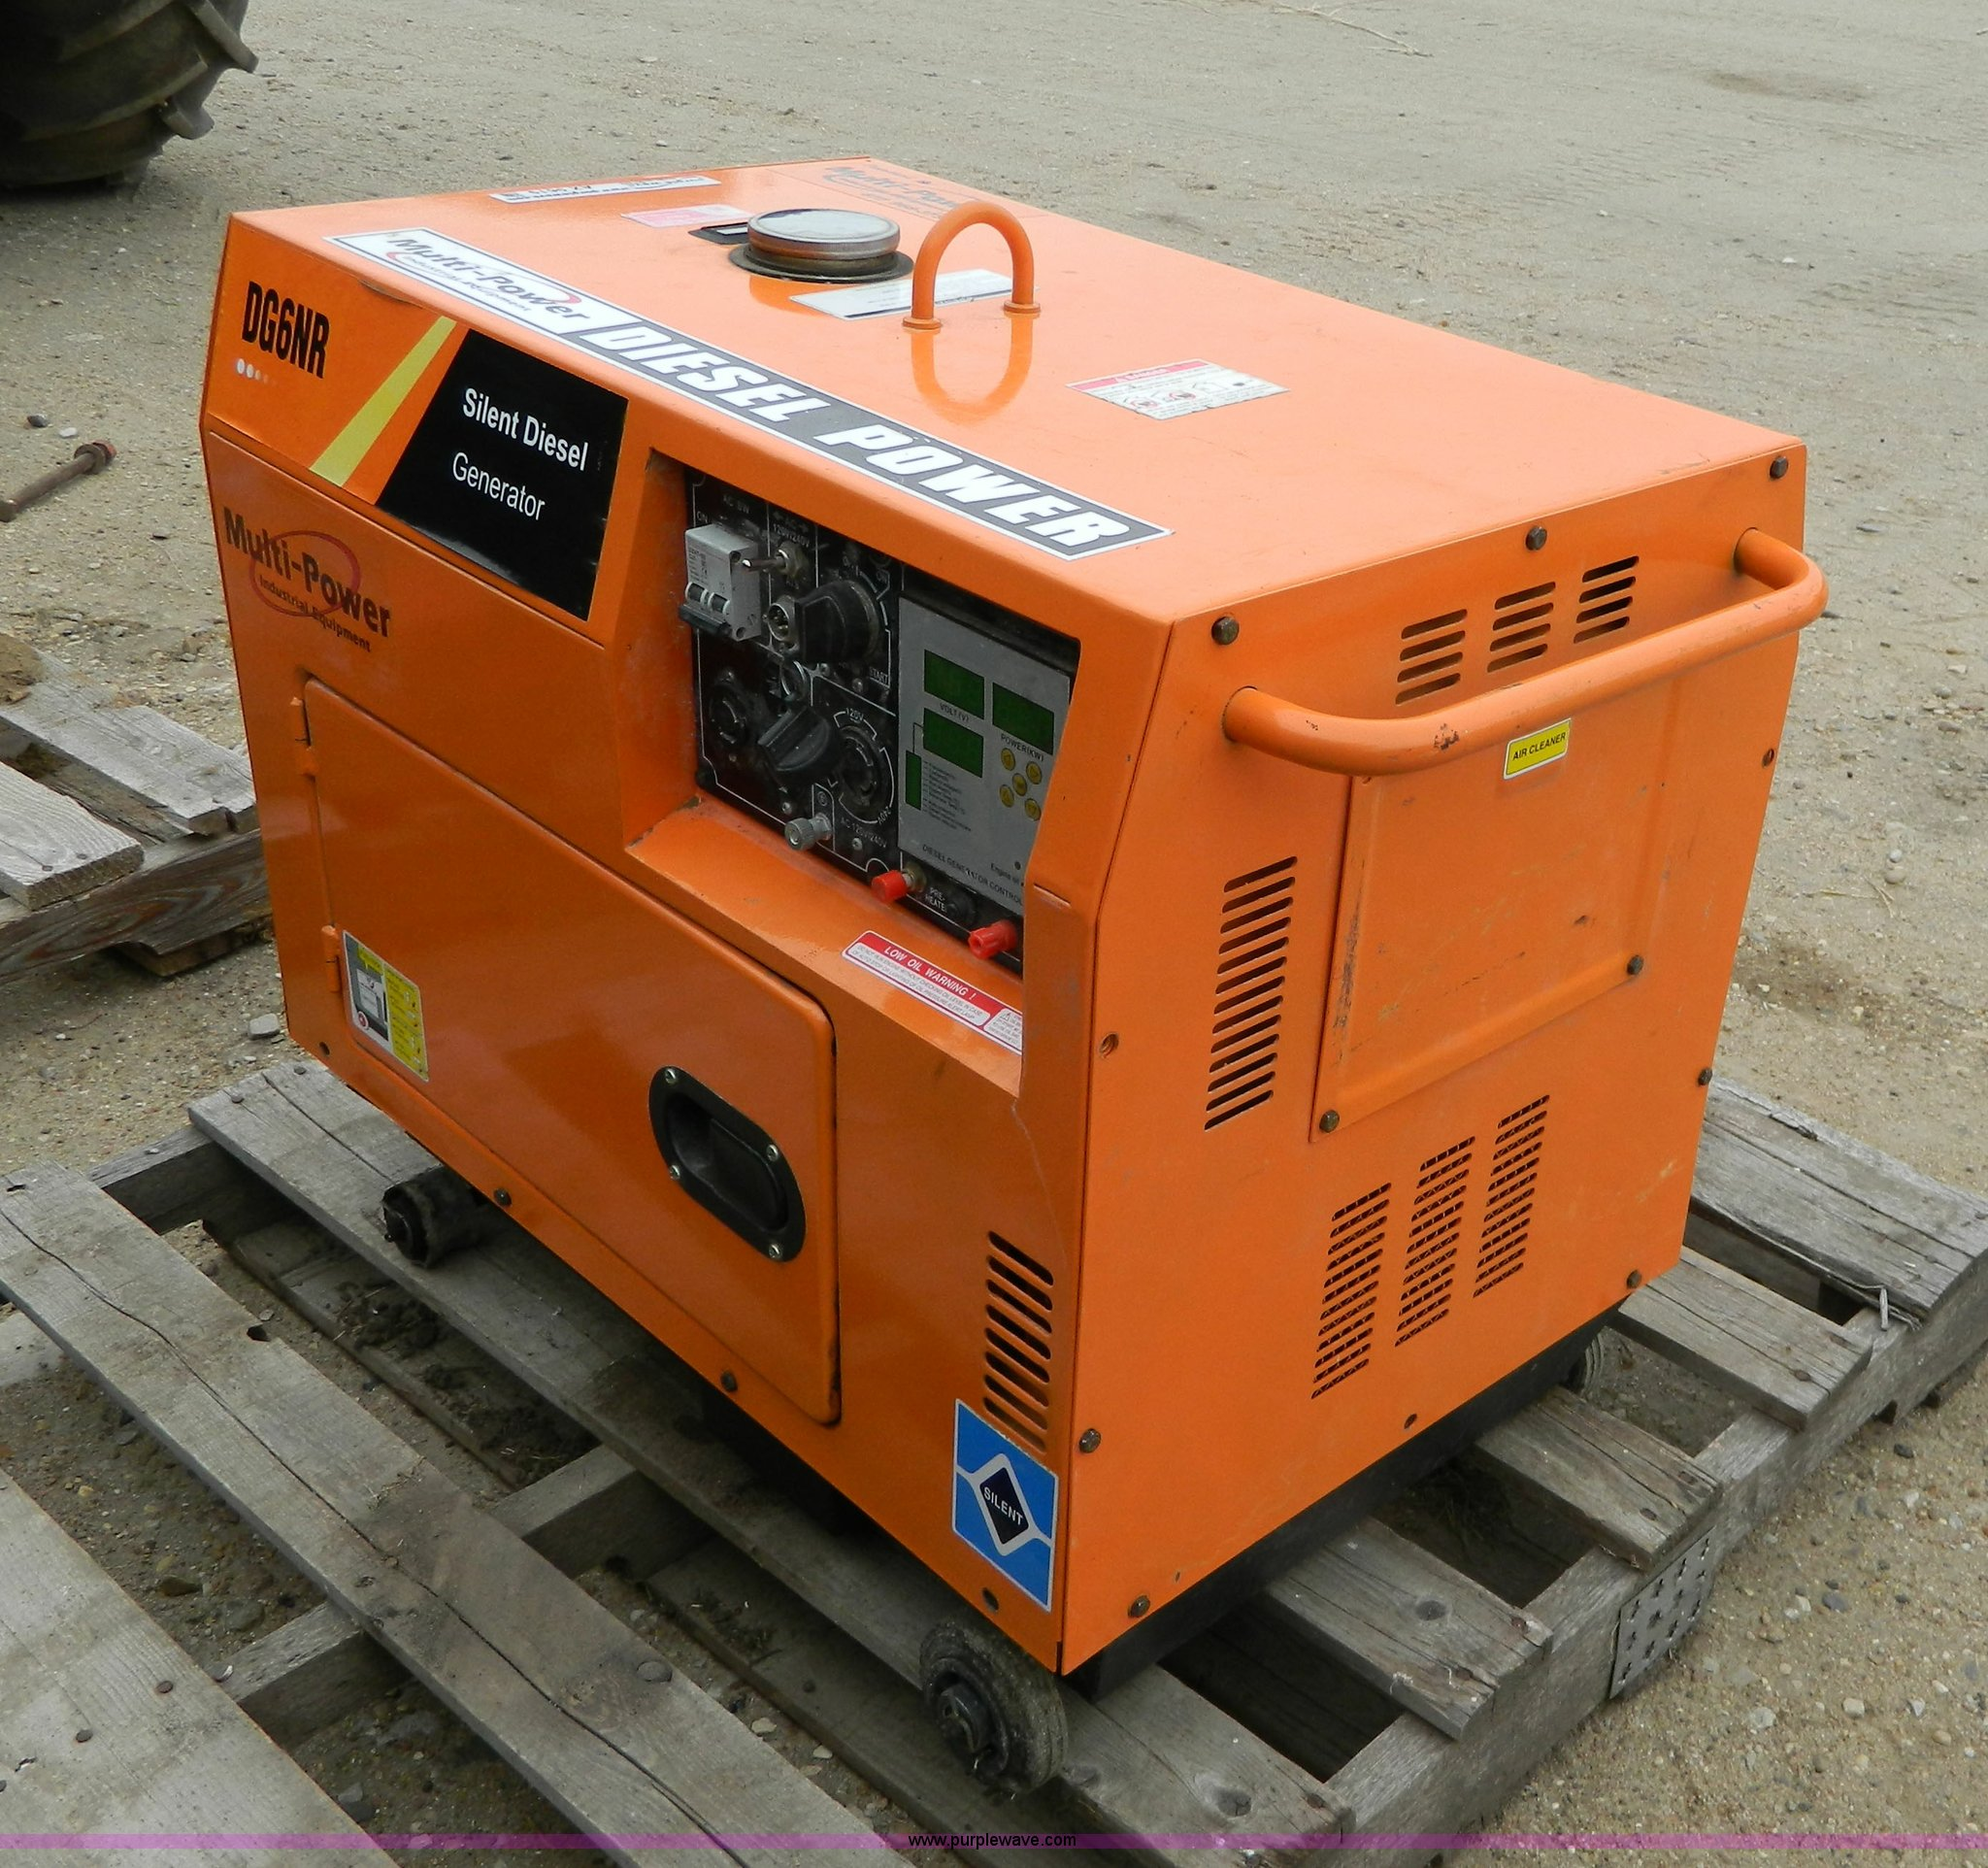 Multi Power DG6NR generator Item AX9619